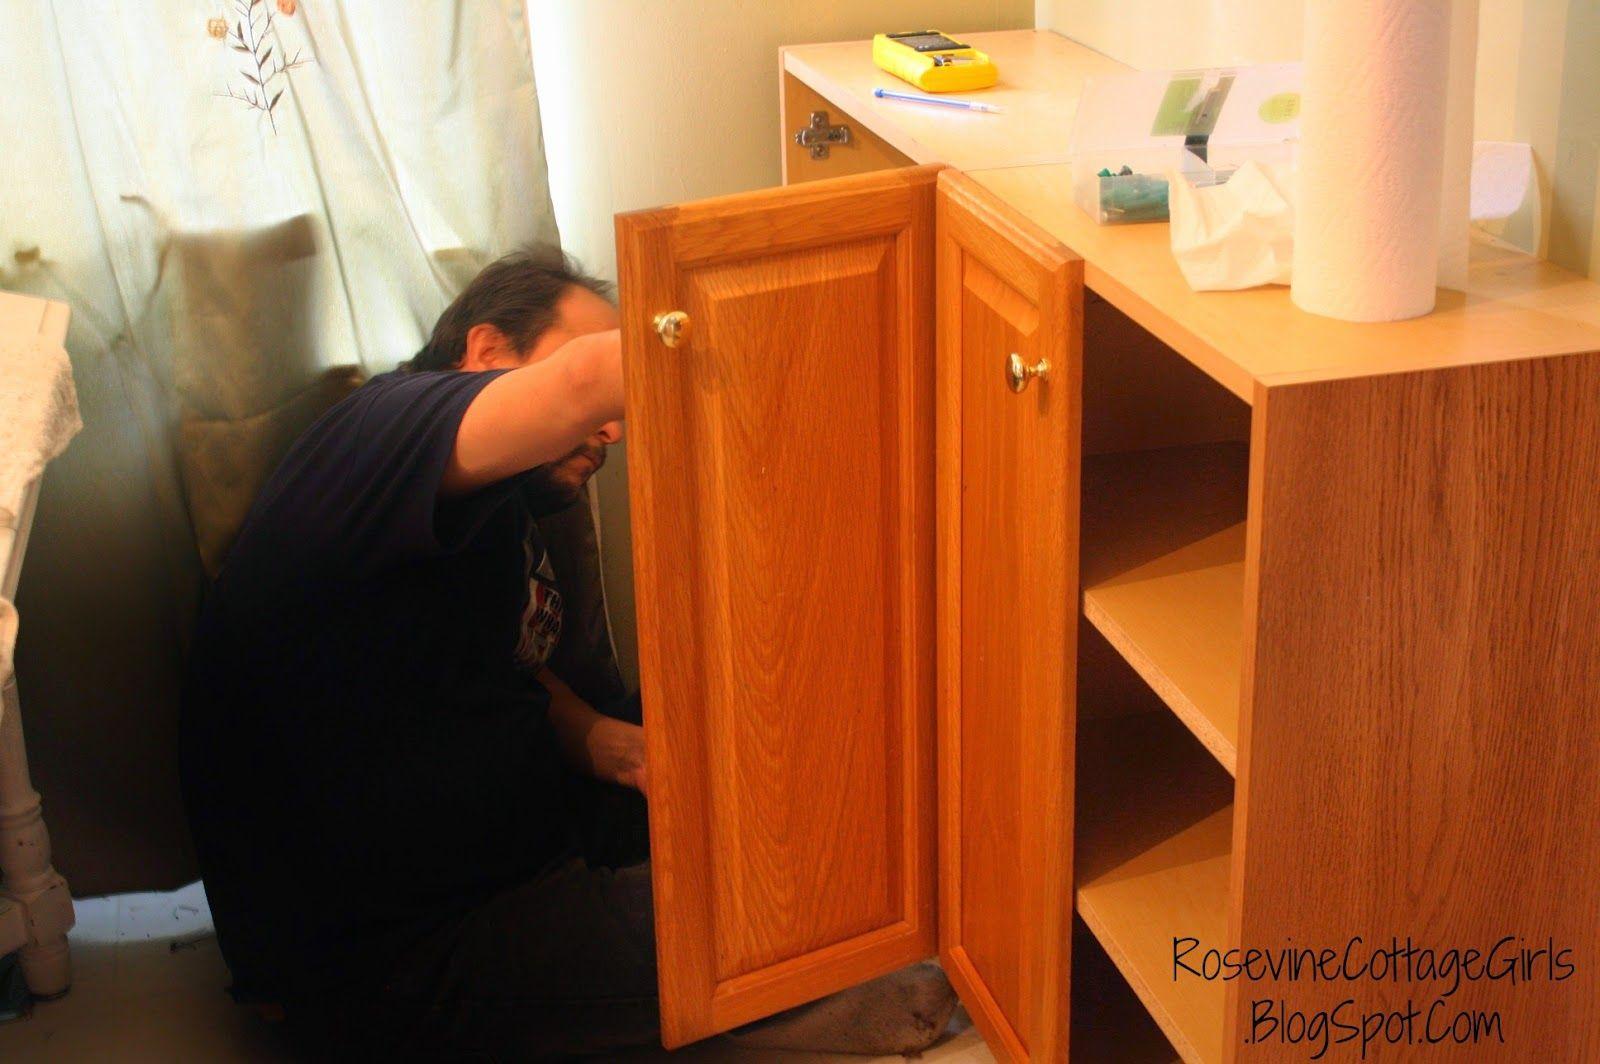 Rosevine Cottage Girls: Installing Cabinets With Mr. Cottage